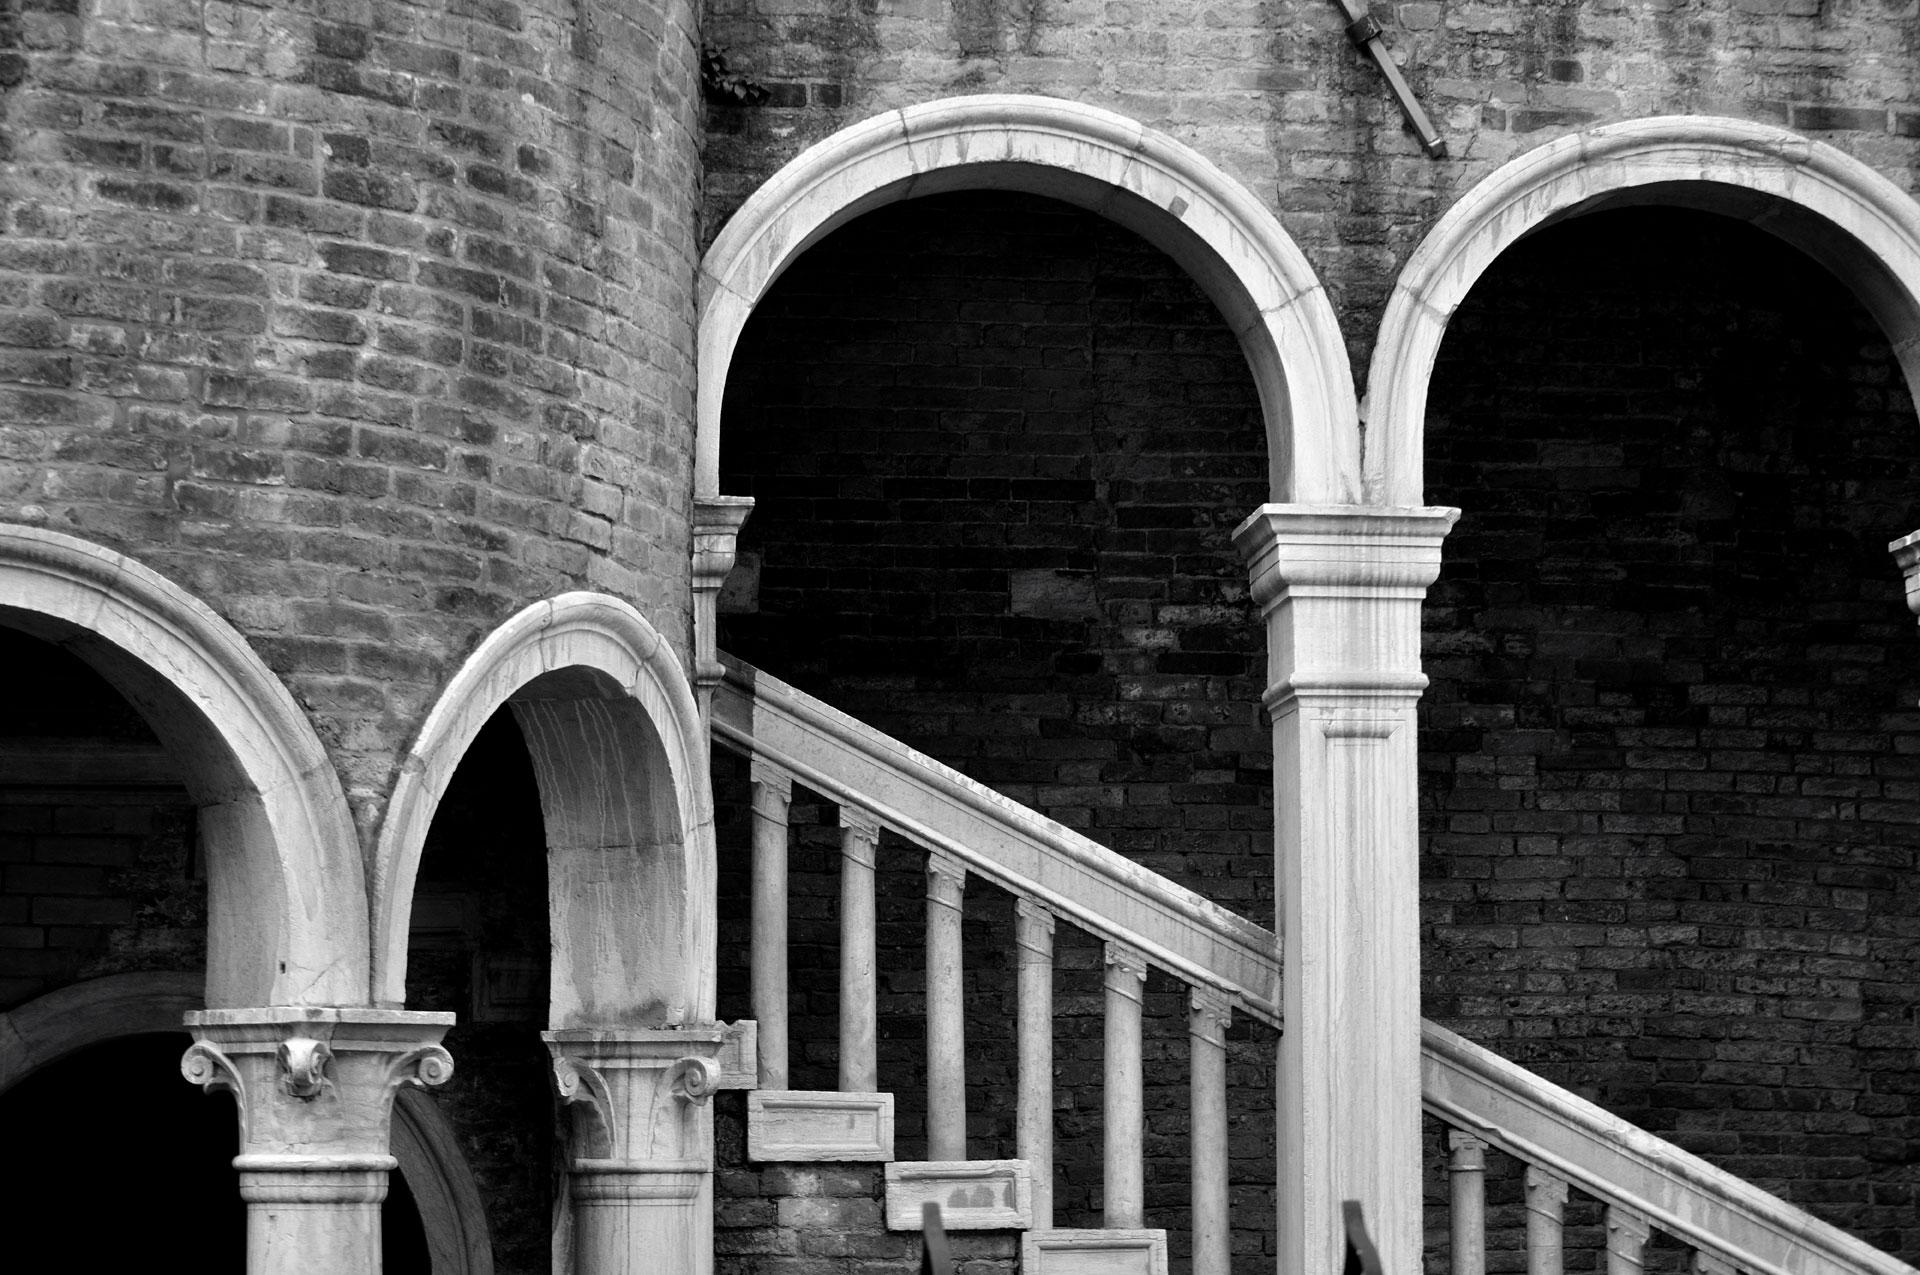 Palazzo Contarini Detail